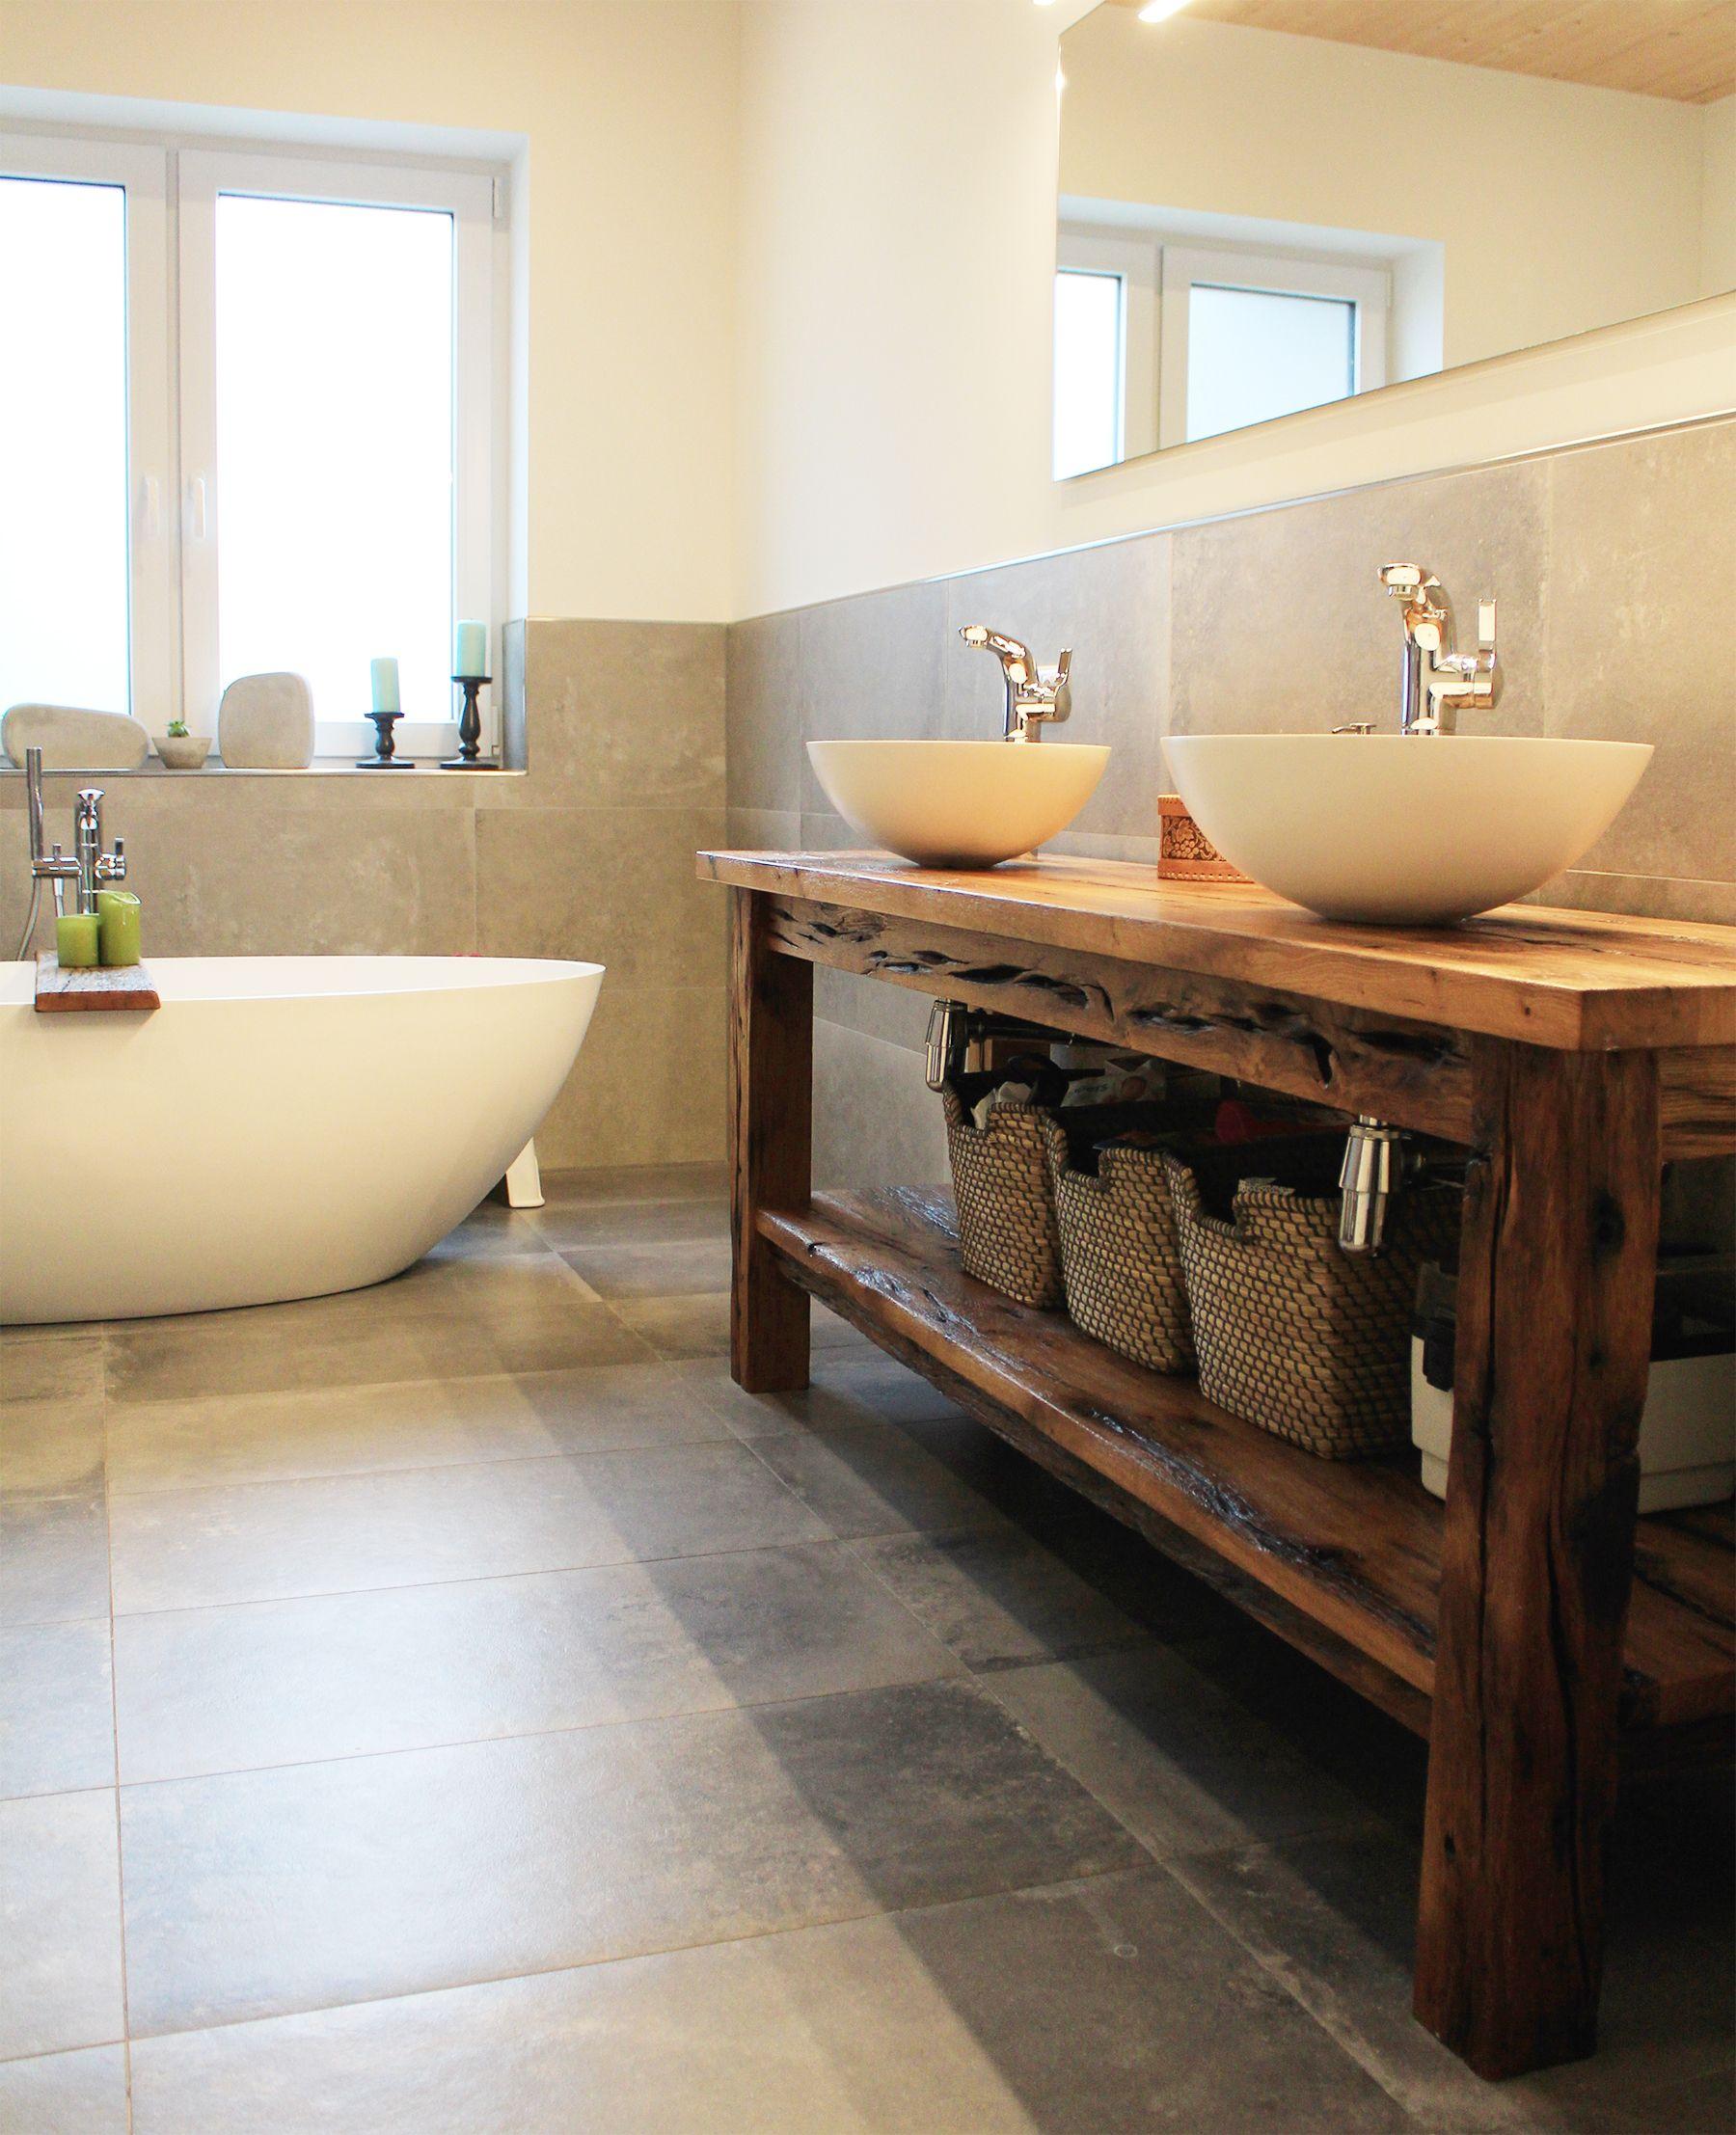 Fruher Bootssteg Heute Waschtisch Badezimmer Innenausstattung Waschtisch Mobel Aus Altholz